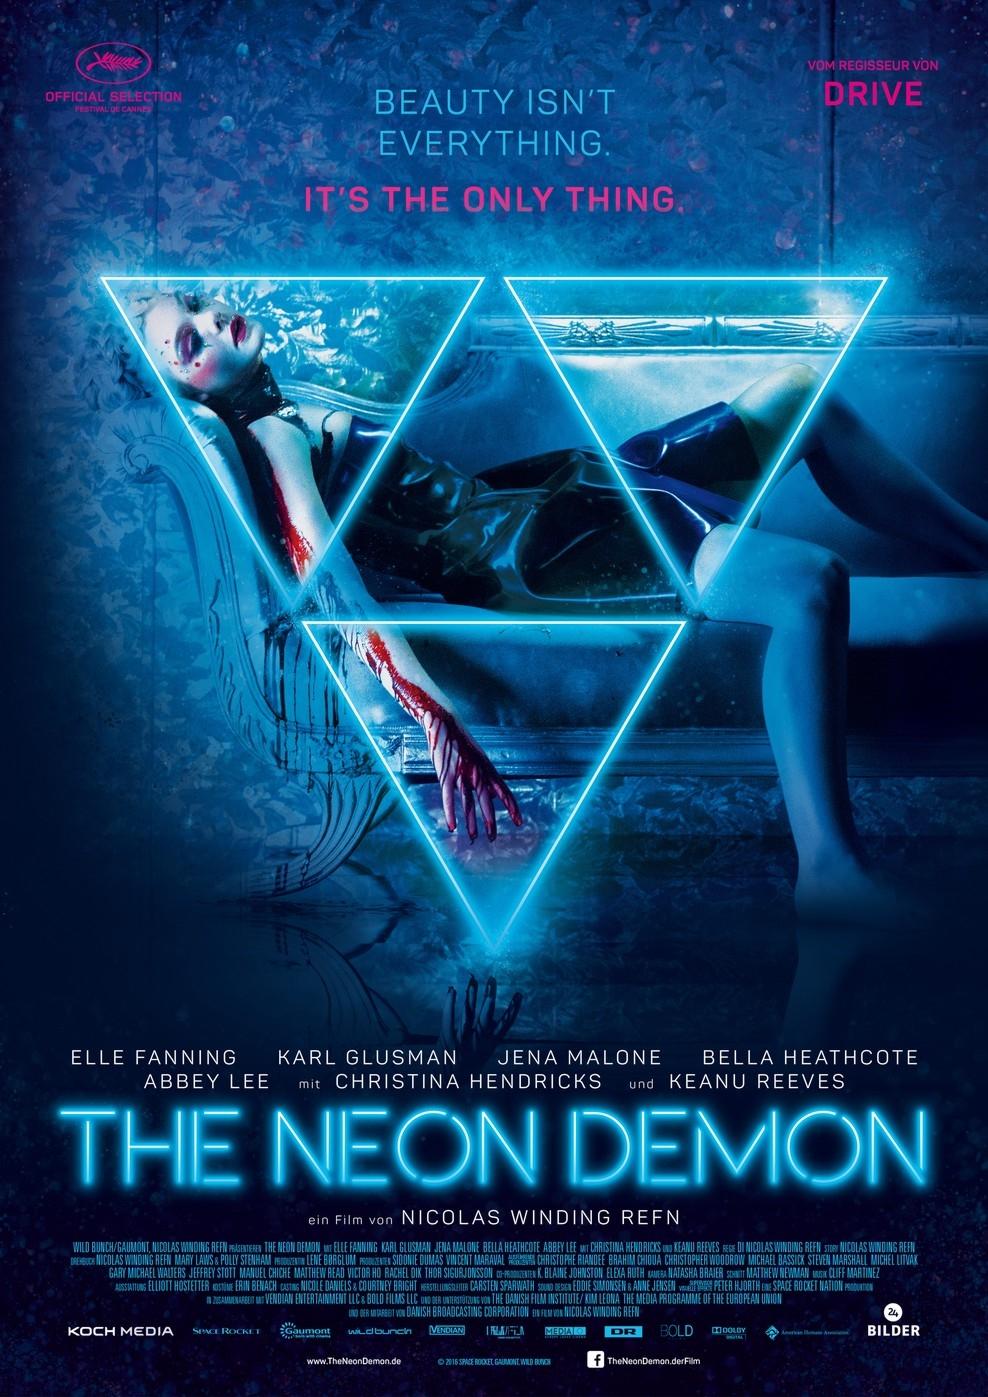 The Neon Demon (Poster)